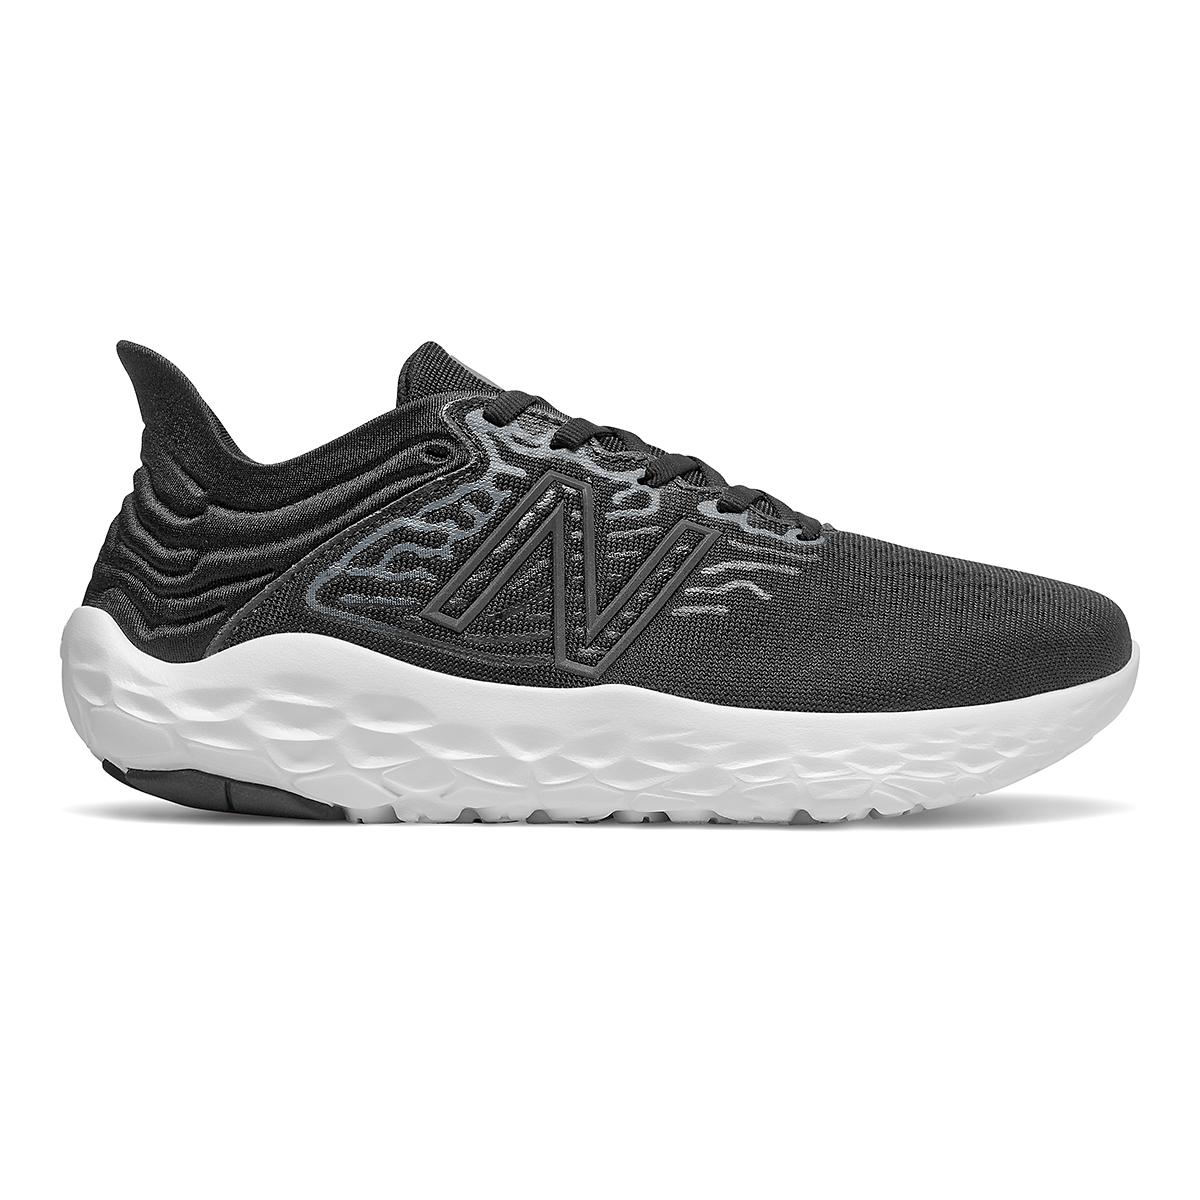 Women's New Balance Beacon V3 Running Shoe - Color: Black - Size: 6.5 - Width: Regular, Black, large, image 1